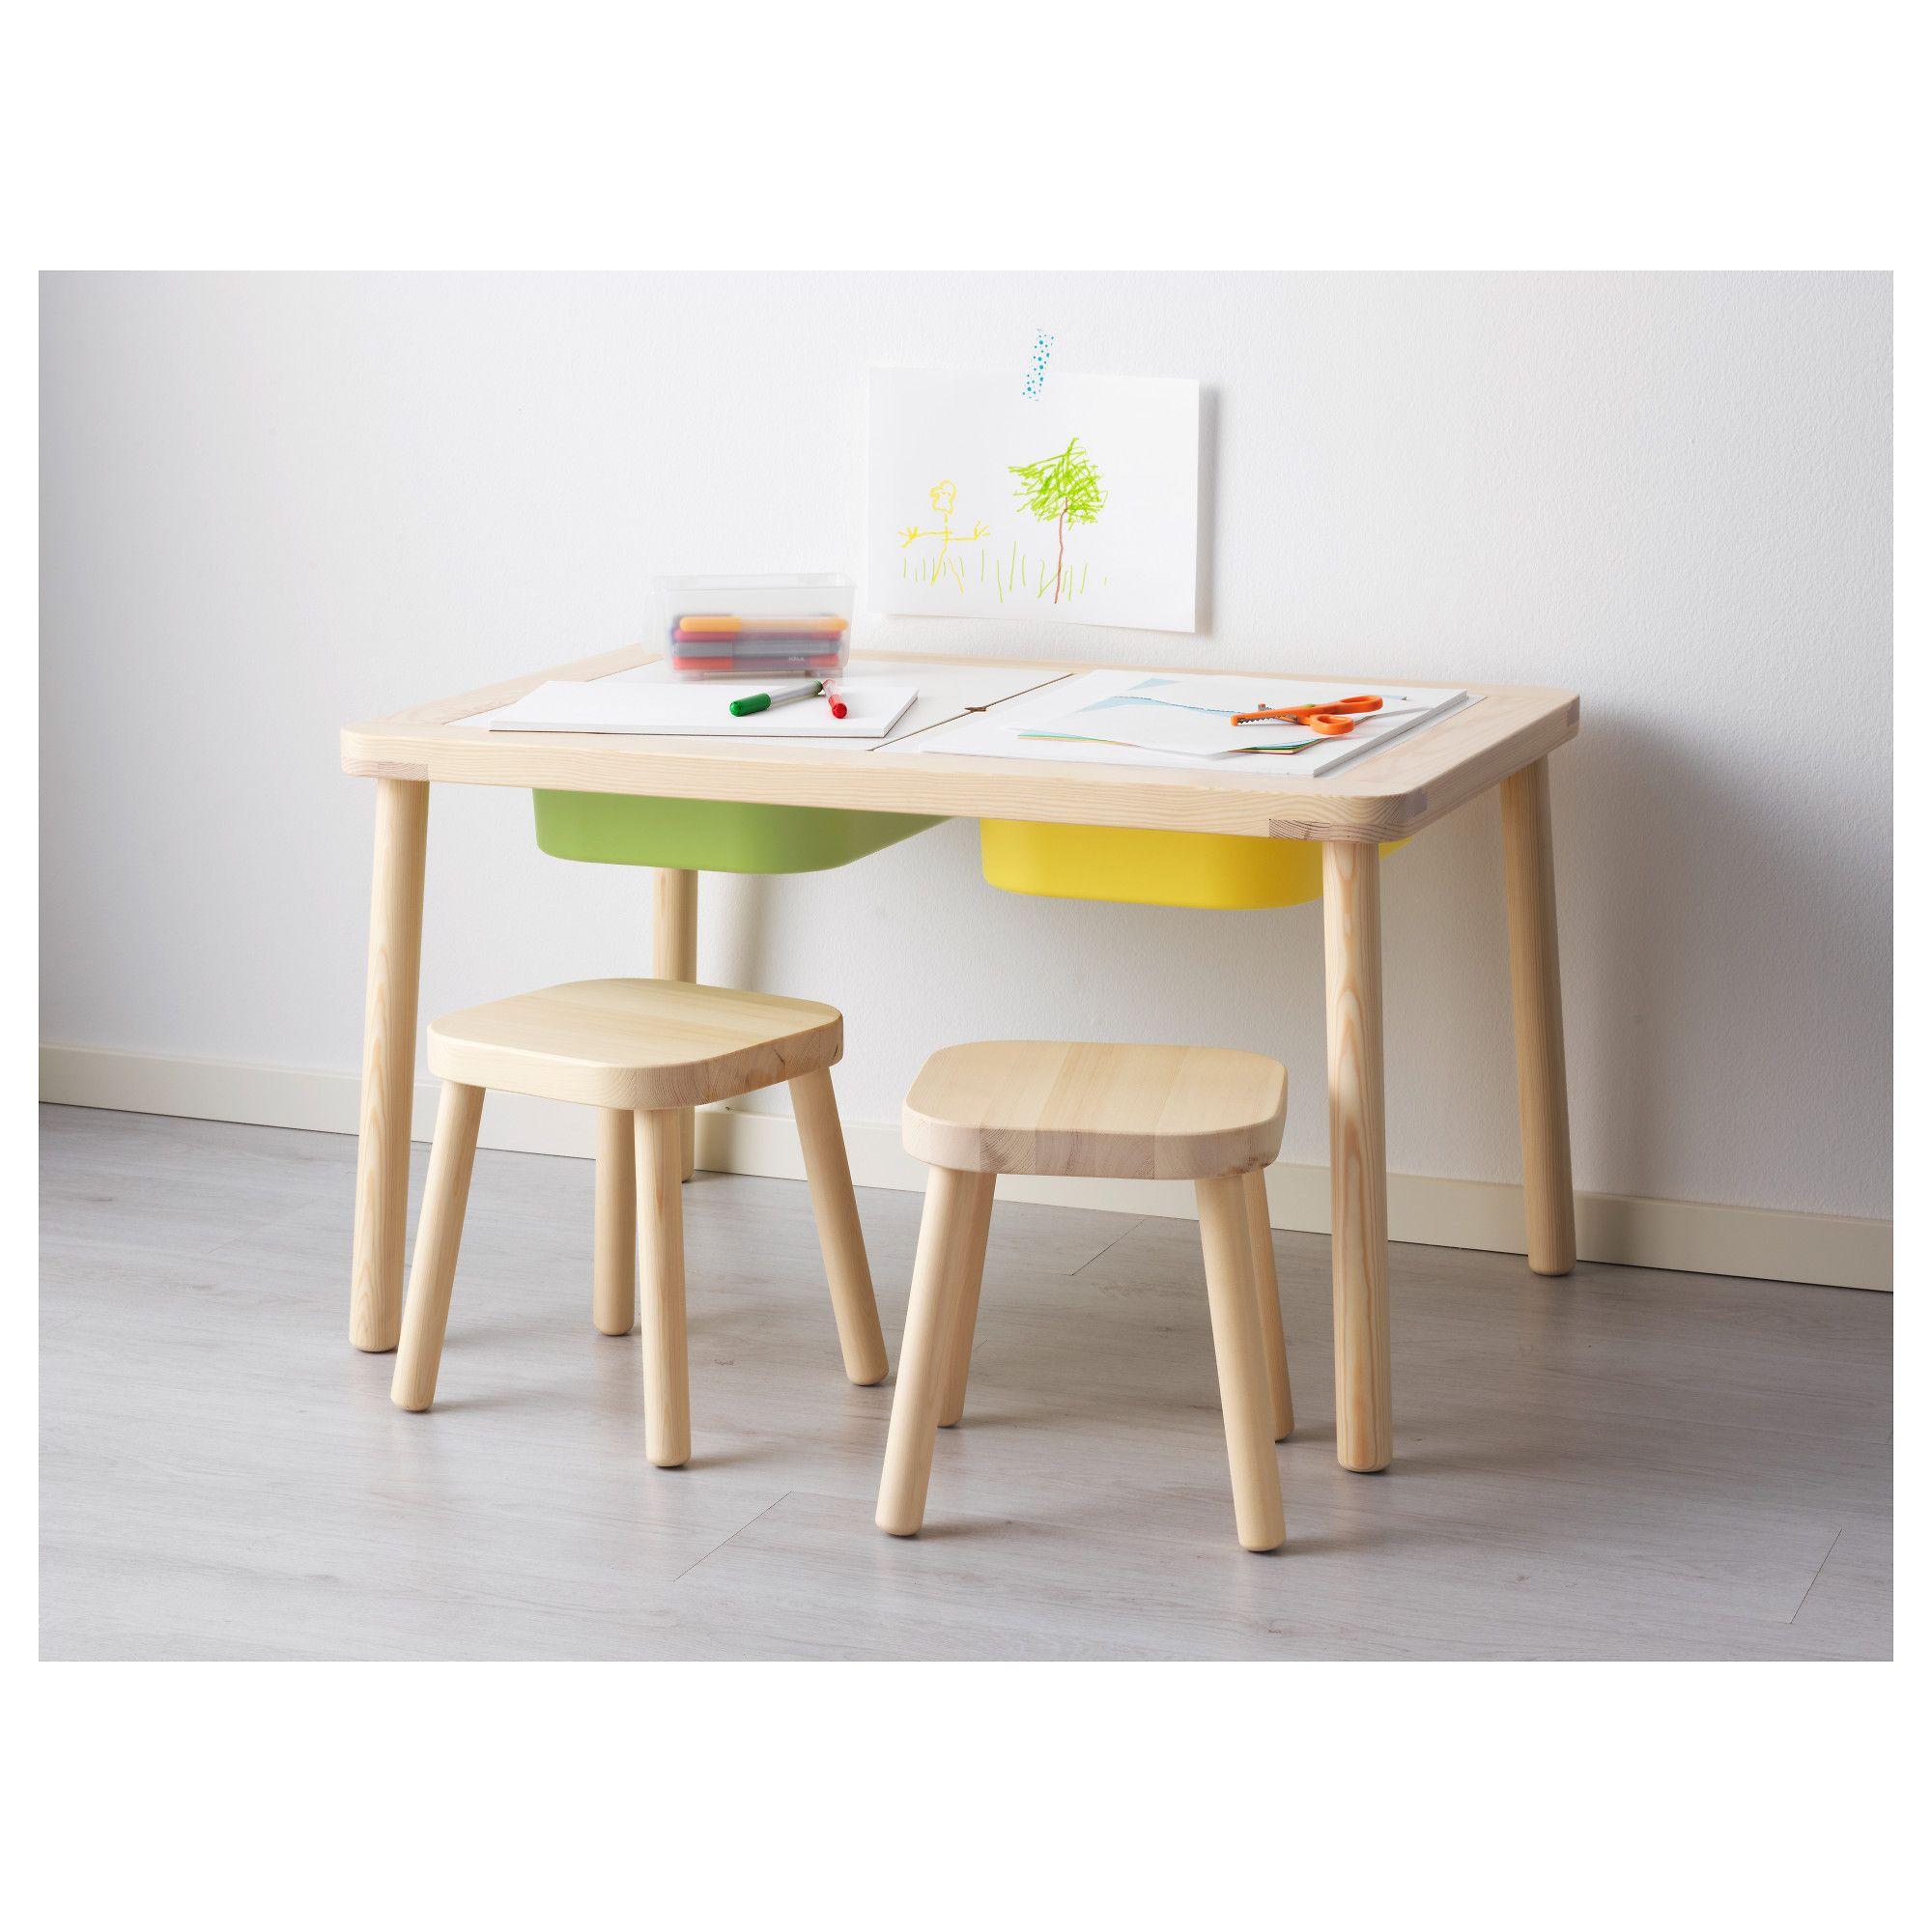 Ikea Kids Table And Chairs Desk Chair Design Flisat Children S 83 X 58 Cm Big Boy Room Ideas Playroom 83x58